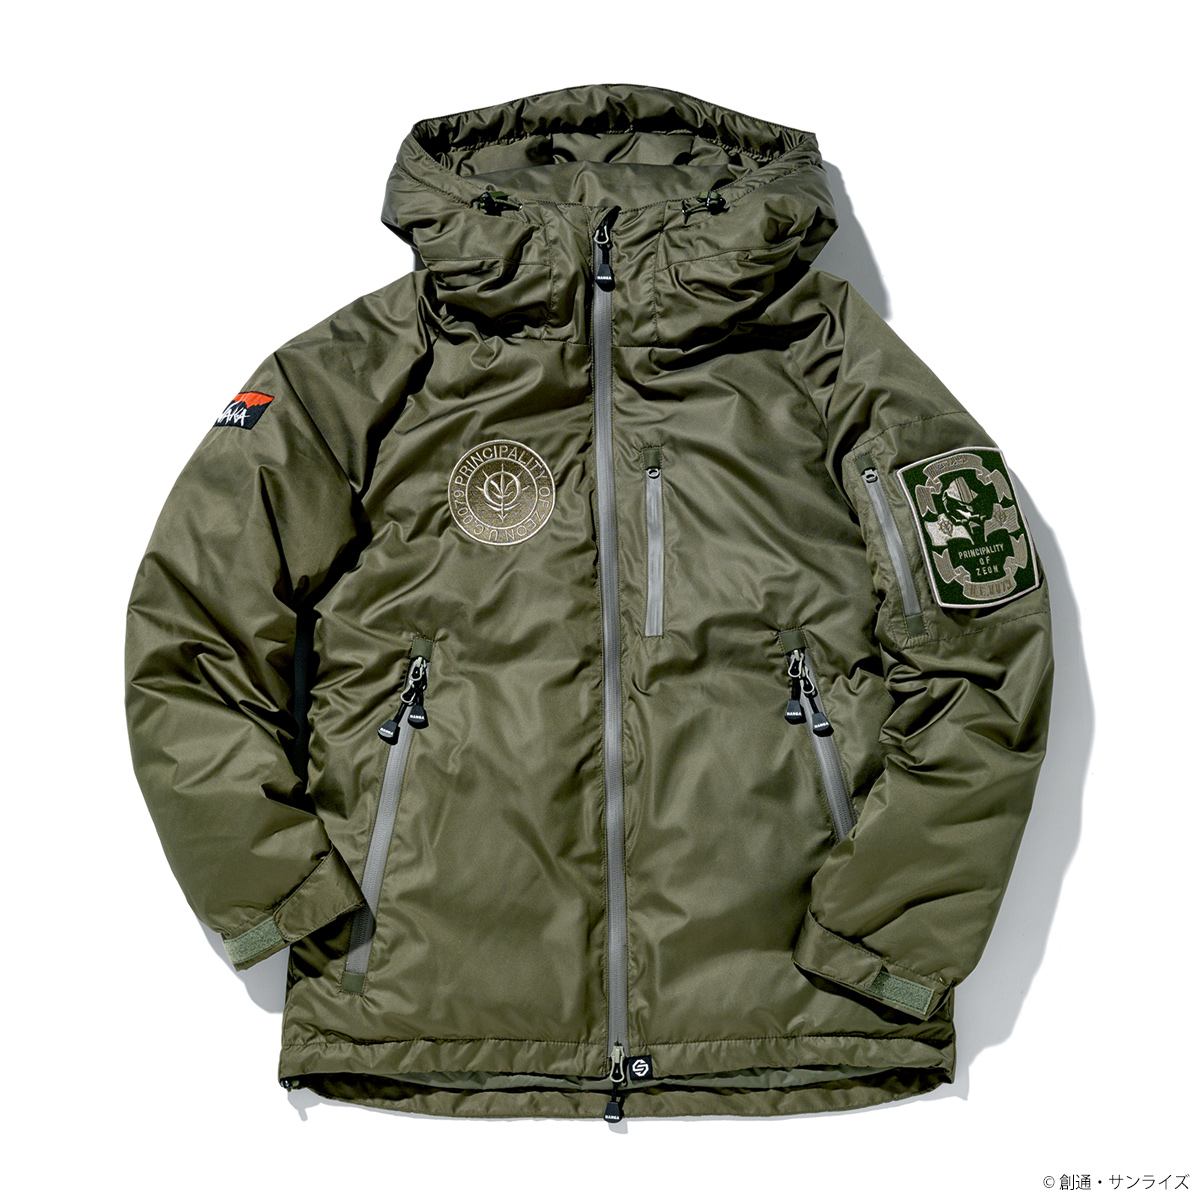 STRICT-G × NANGA ダウンジャケット『機動戦士ガンダム』40周年記念 ジオン軍モデル